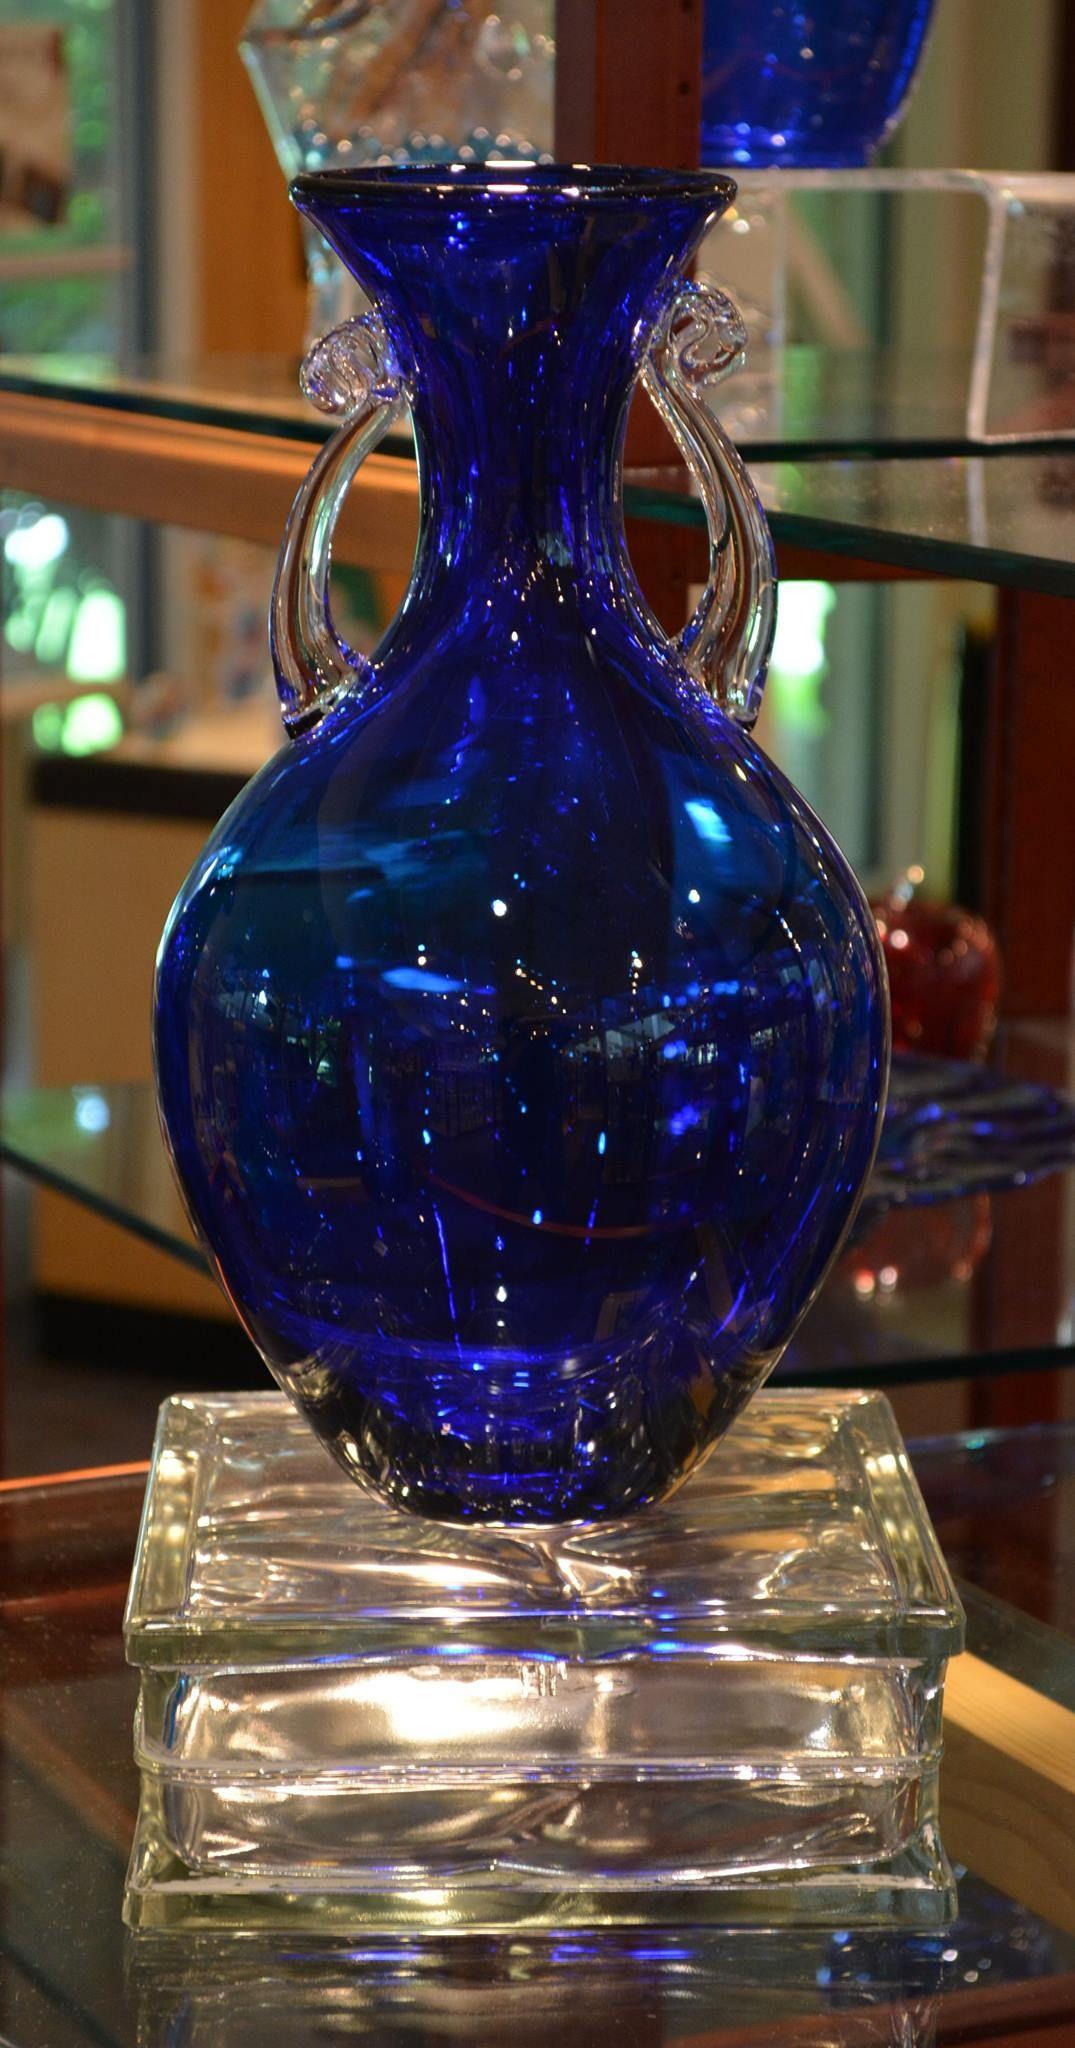 Blenko glass httpwpsubscribershoptopogiyo httpwww cobalt blue vase by blenko glass floridaeventfo Image collections